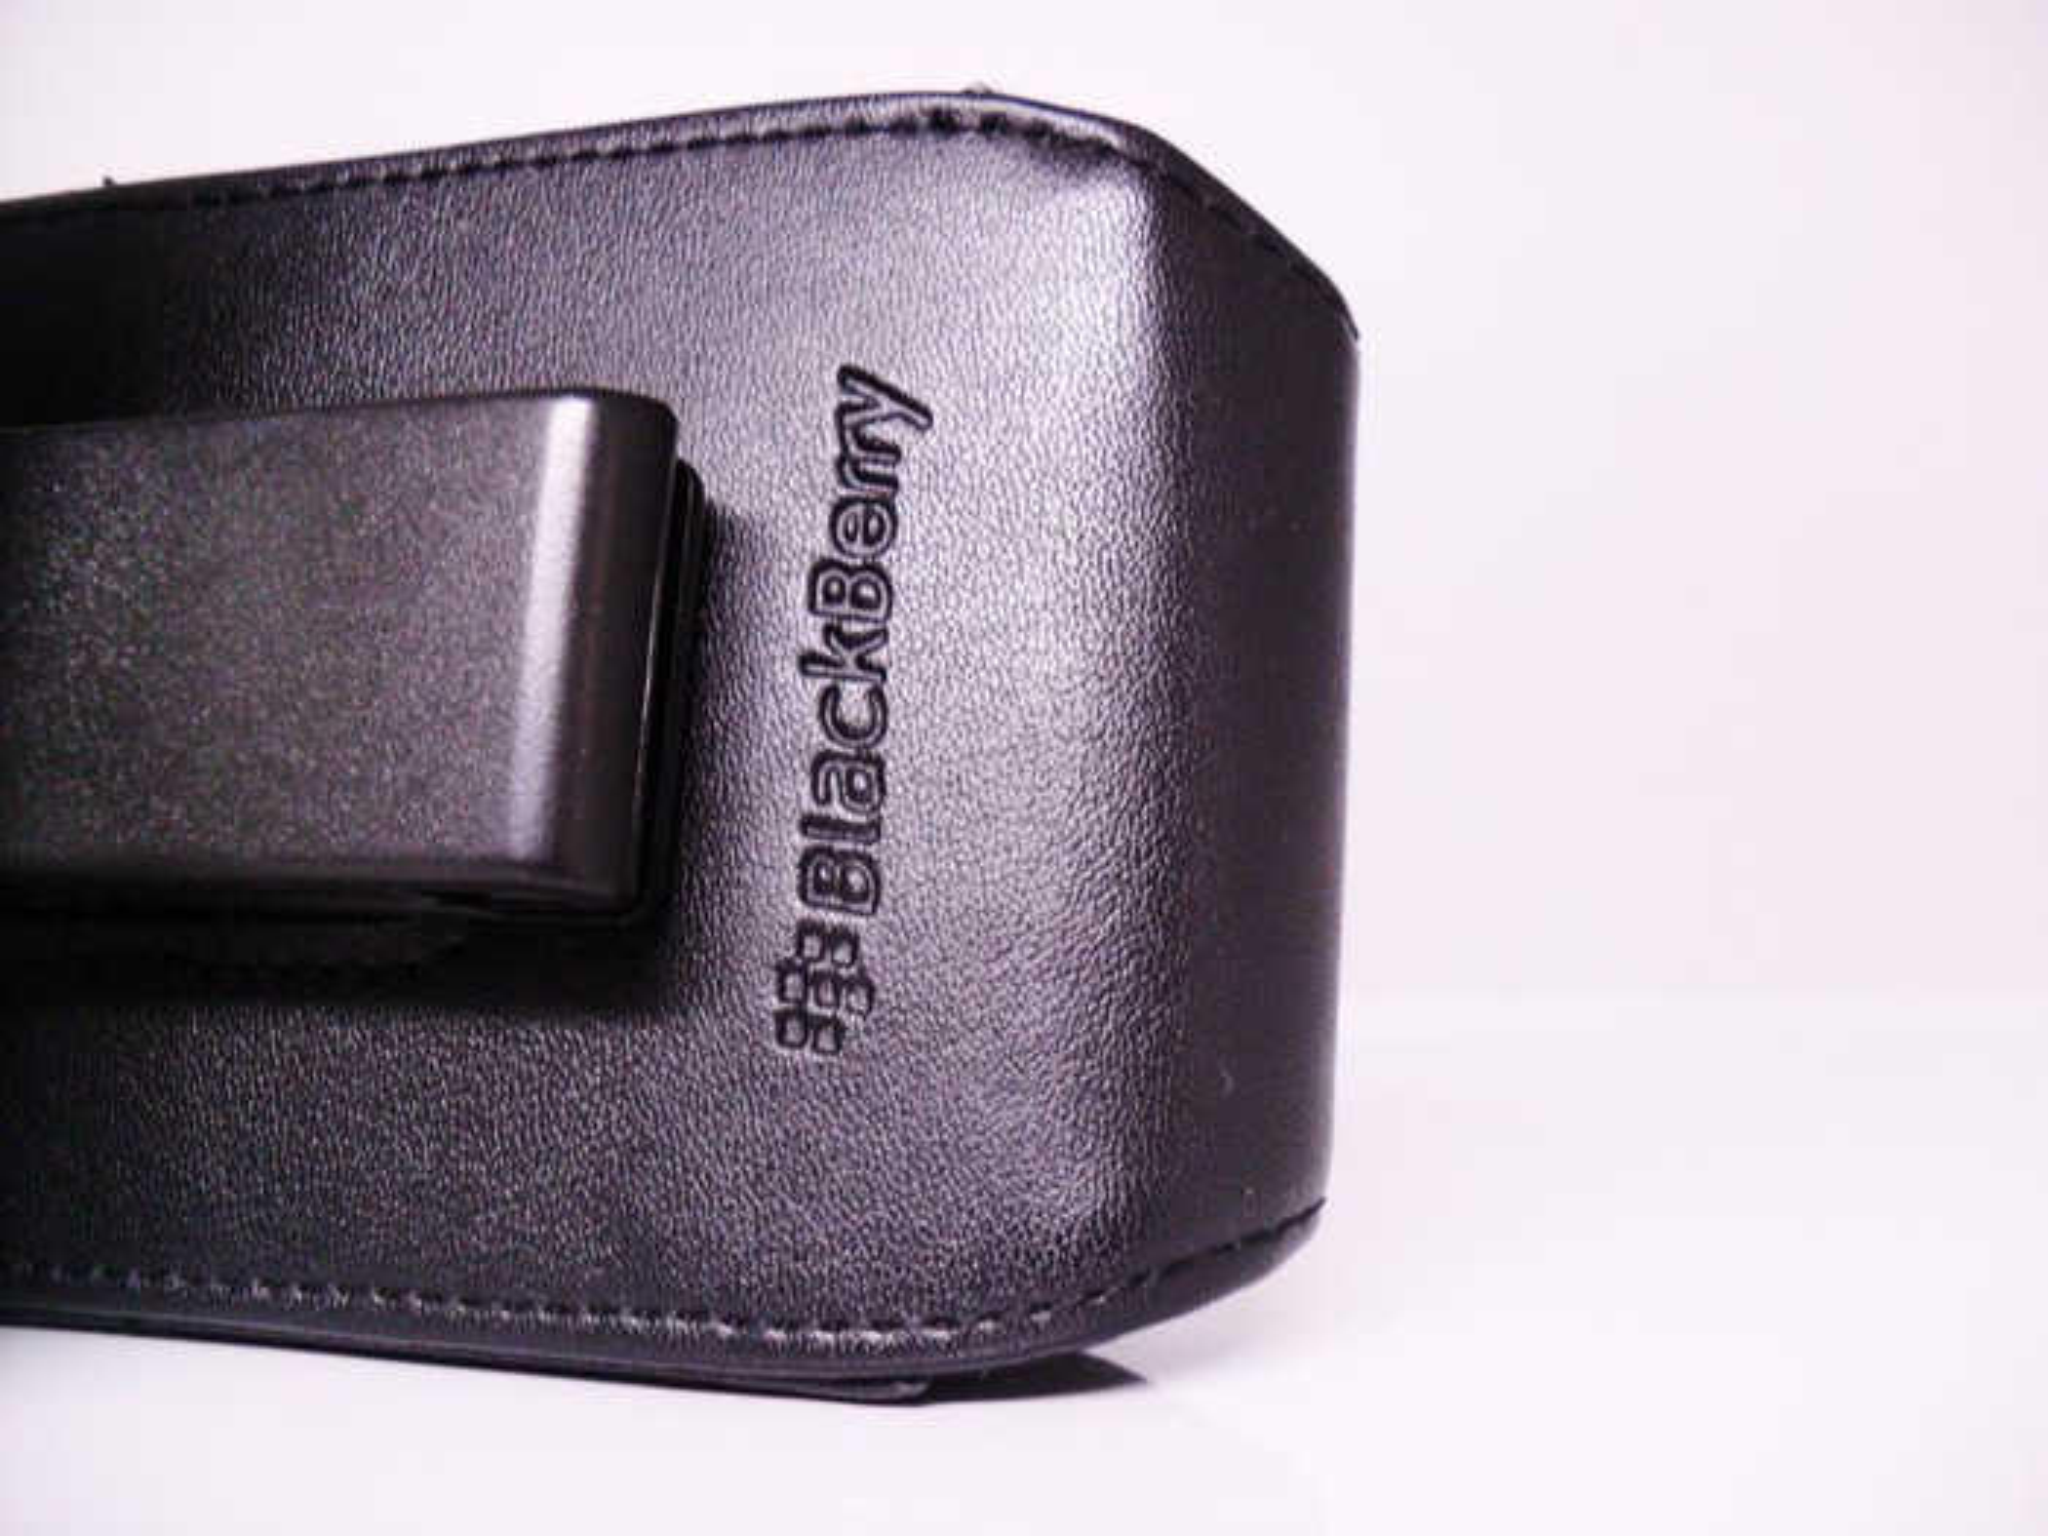 A Blackberry phone case.